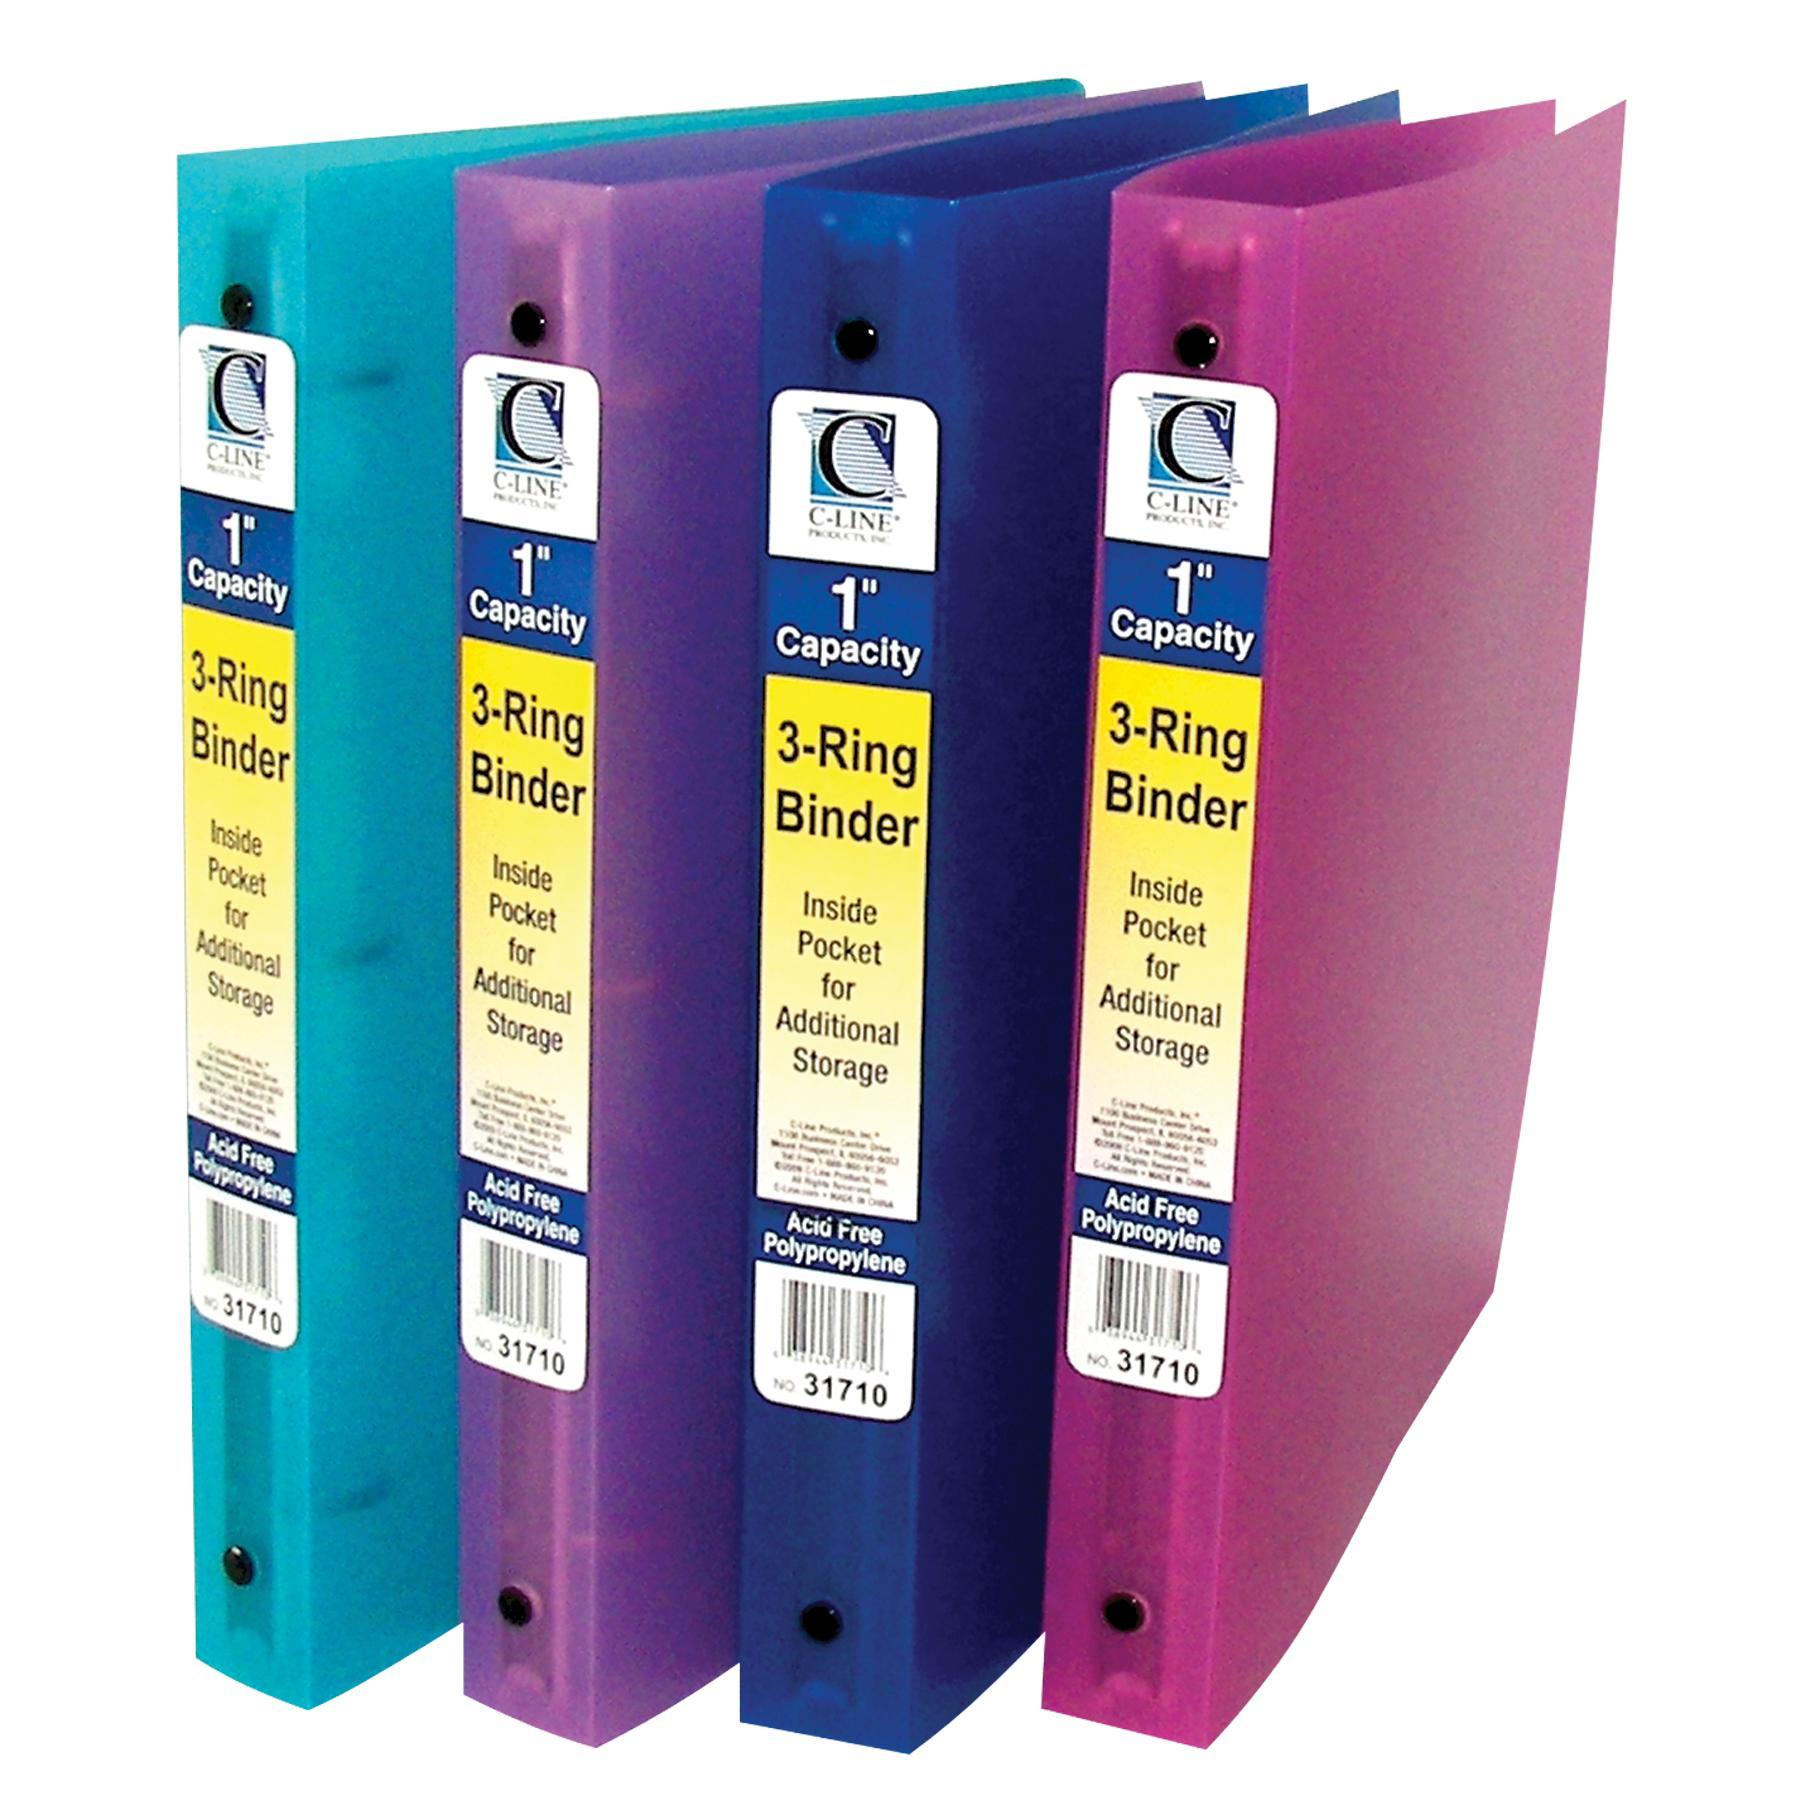 C-Line Self-Adhesive Ring Binder Label Holders, Top Load